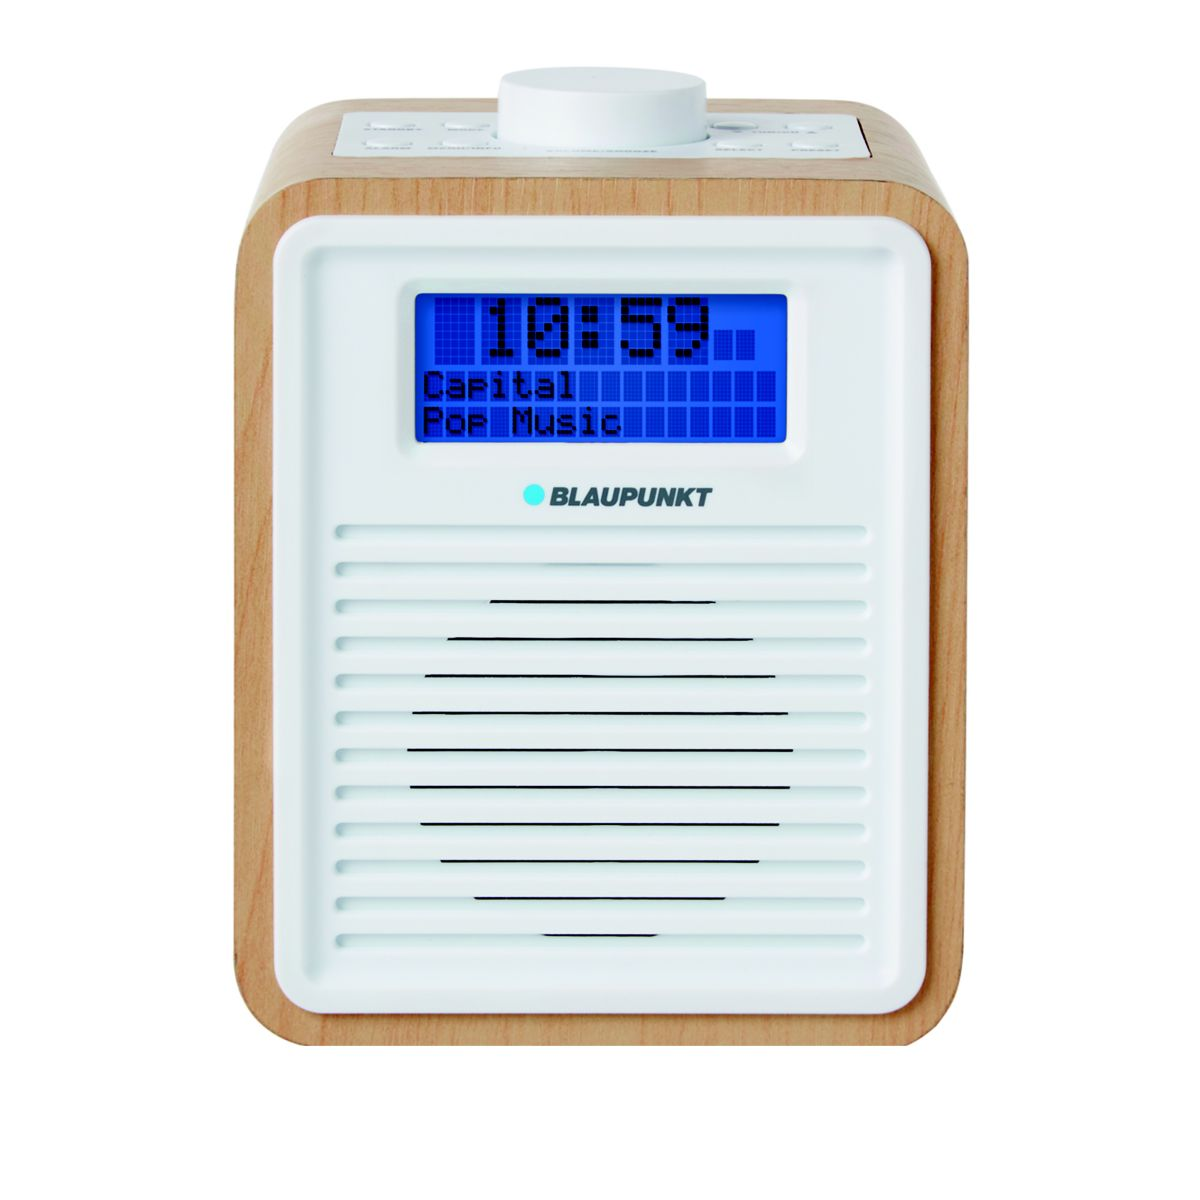 blaupunkt ne 6006 dab fm digital alarm clock radio wood effect with 20 preset. Black Bedroom Furniture Sets. Home Design Ideas